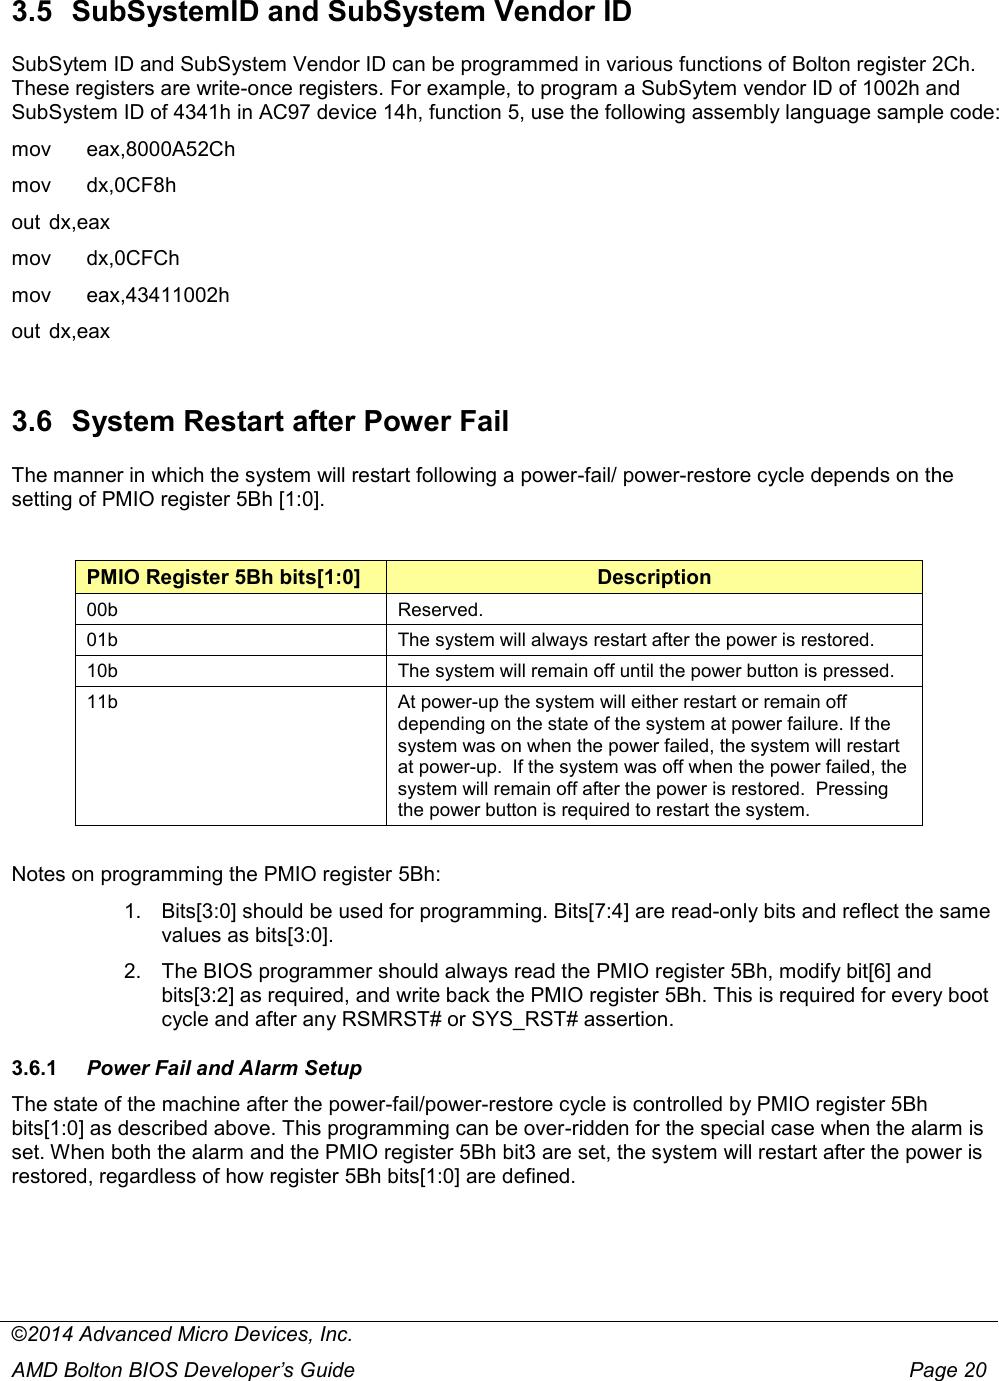 AMD Bolton FCH BIOS Developer's Guide 51205 Dev